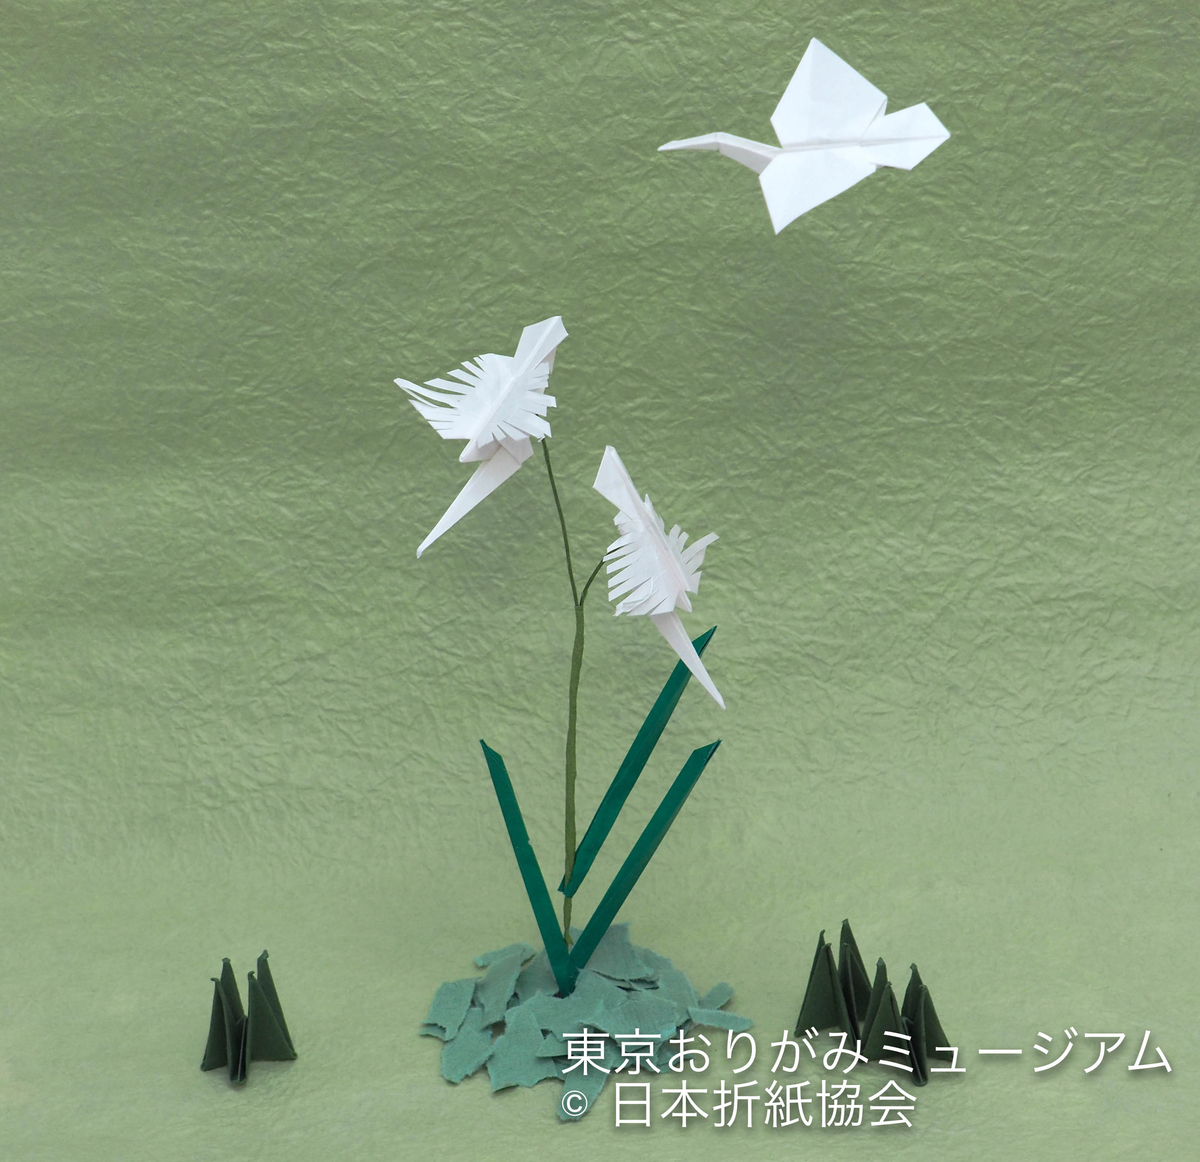 f:id:origami-noa:20190702150543j:plain